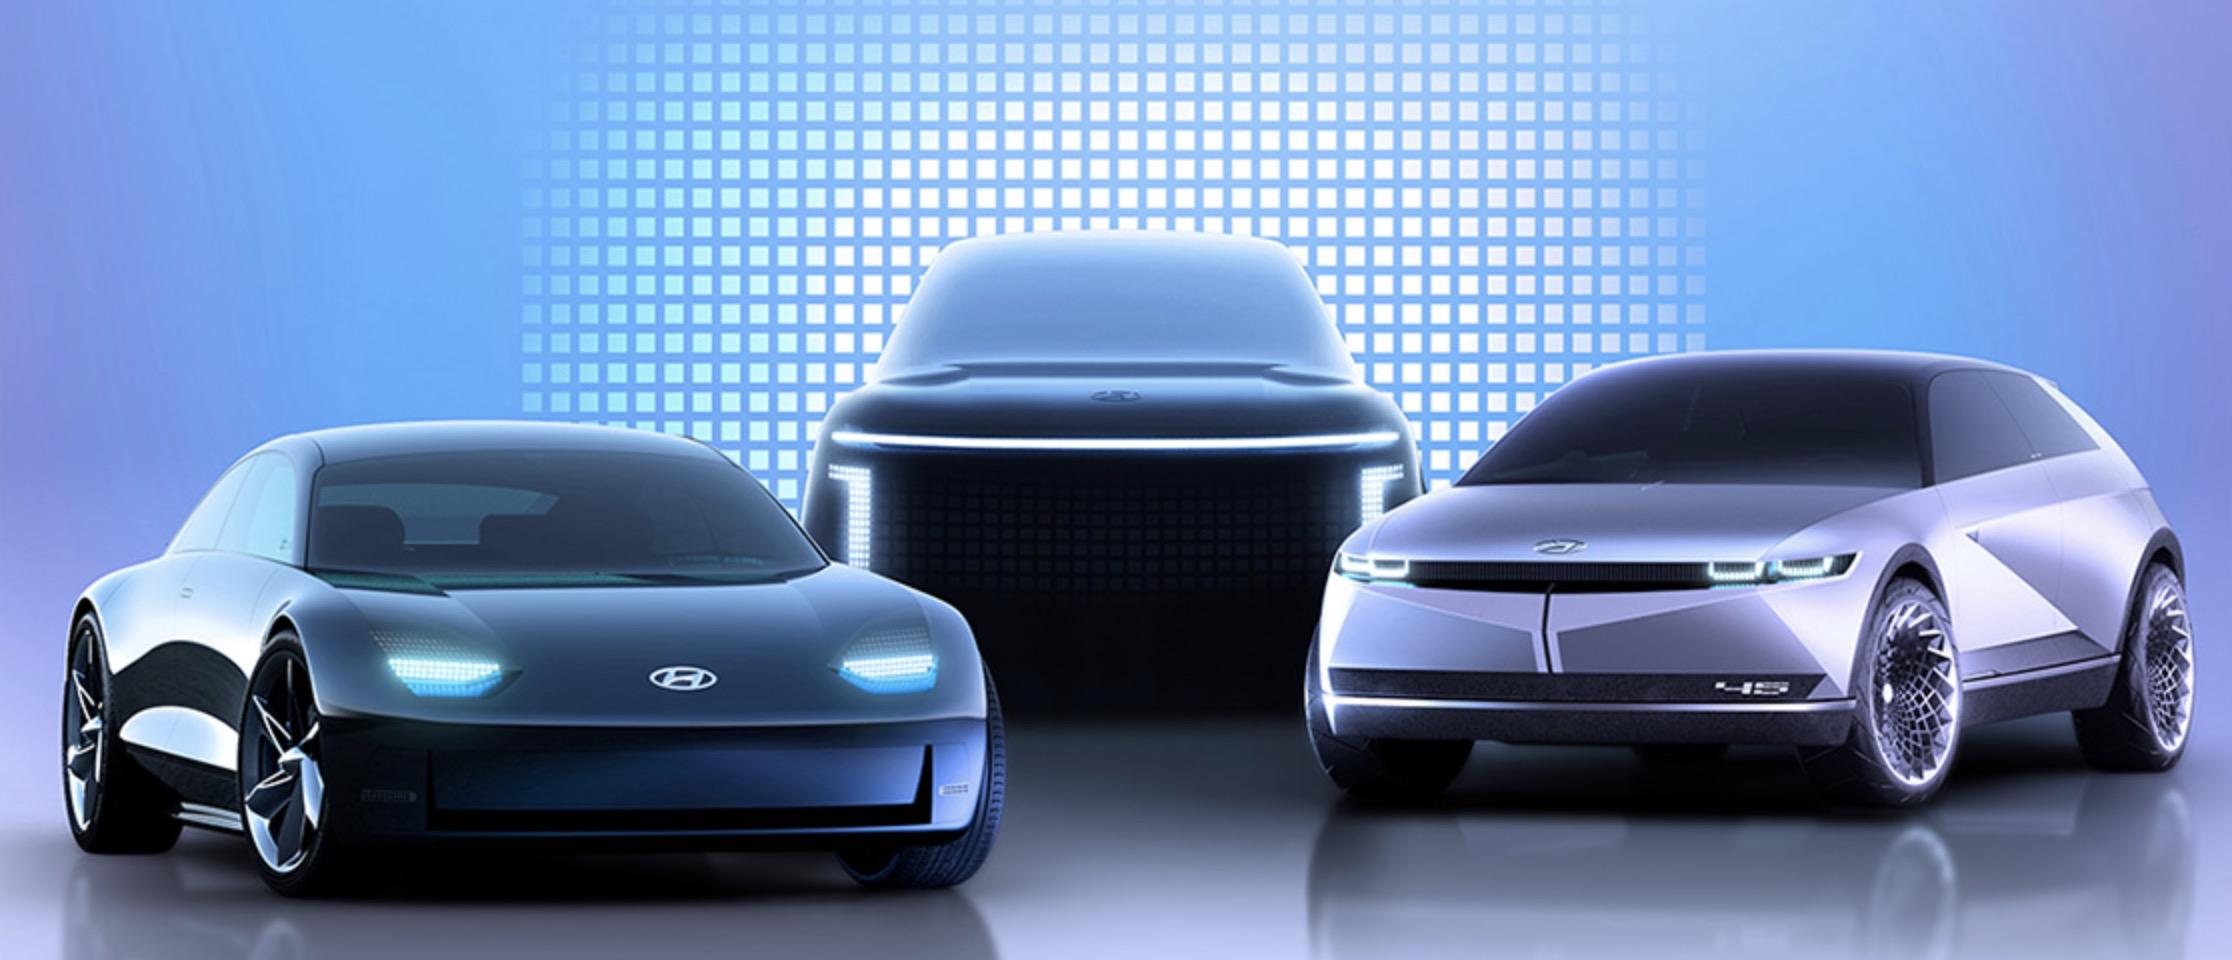 Hyundai Launches Ioniq As New Ev Brand Confirms 3 New Electric Cars Electrek